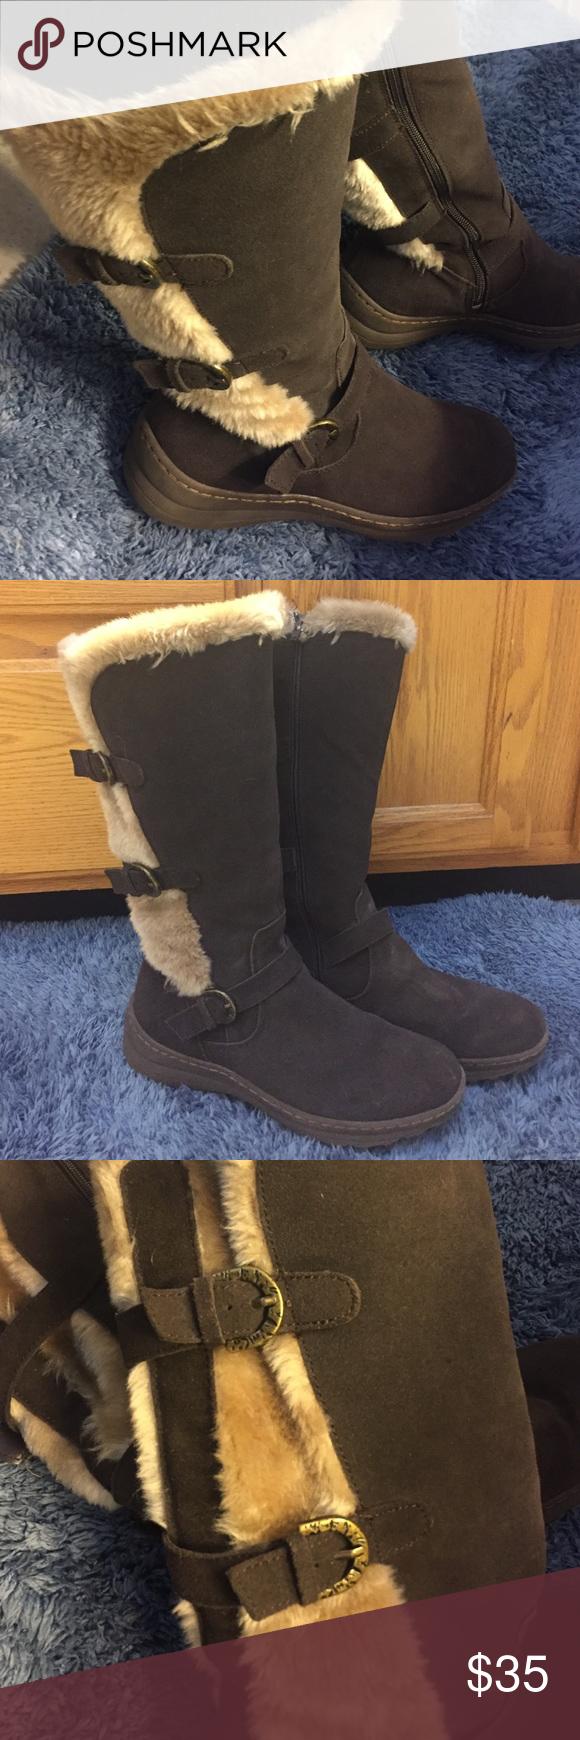 Faux fur lined boots Faux fur lined boots. Leather upper. Gently worn. BareTraps Shoes Winter & Rain Boots